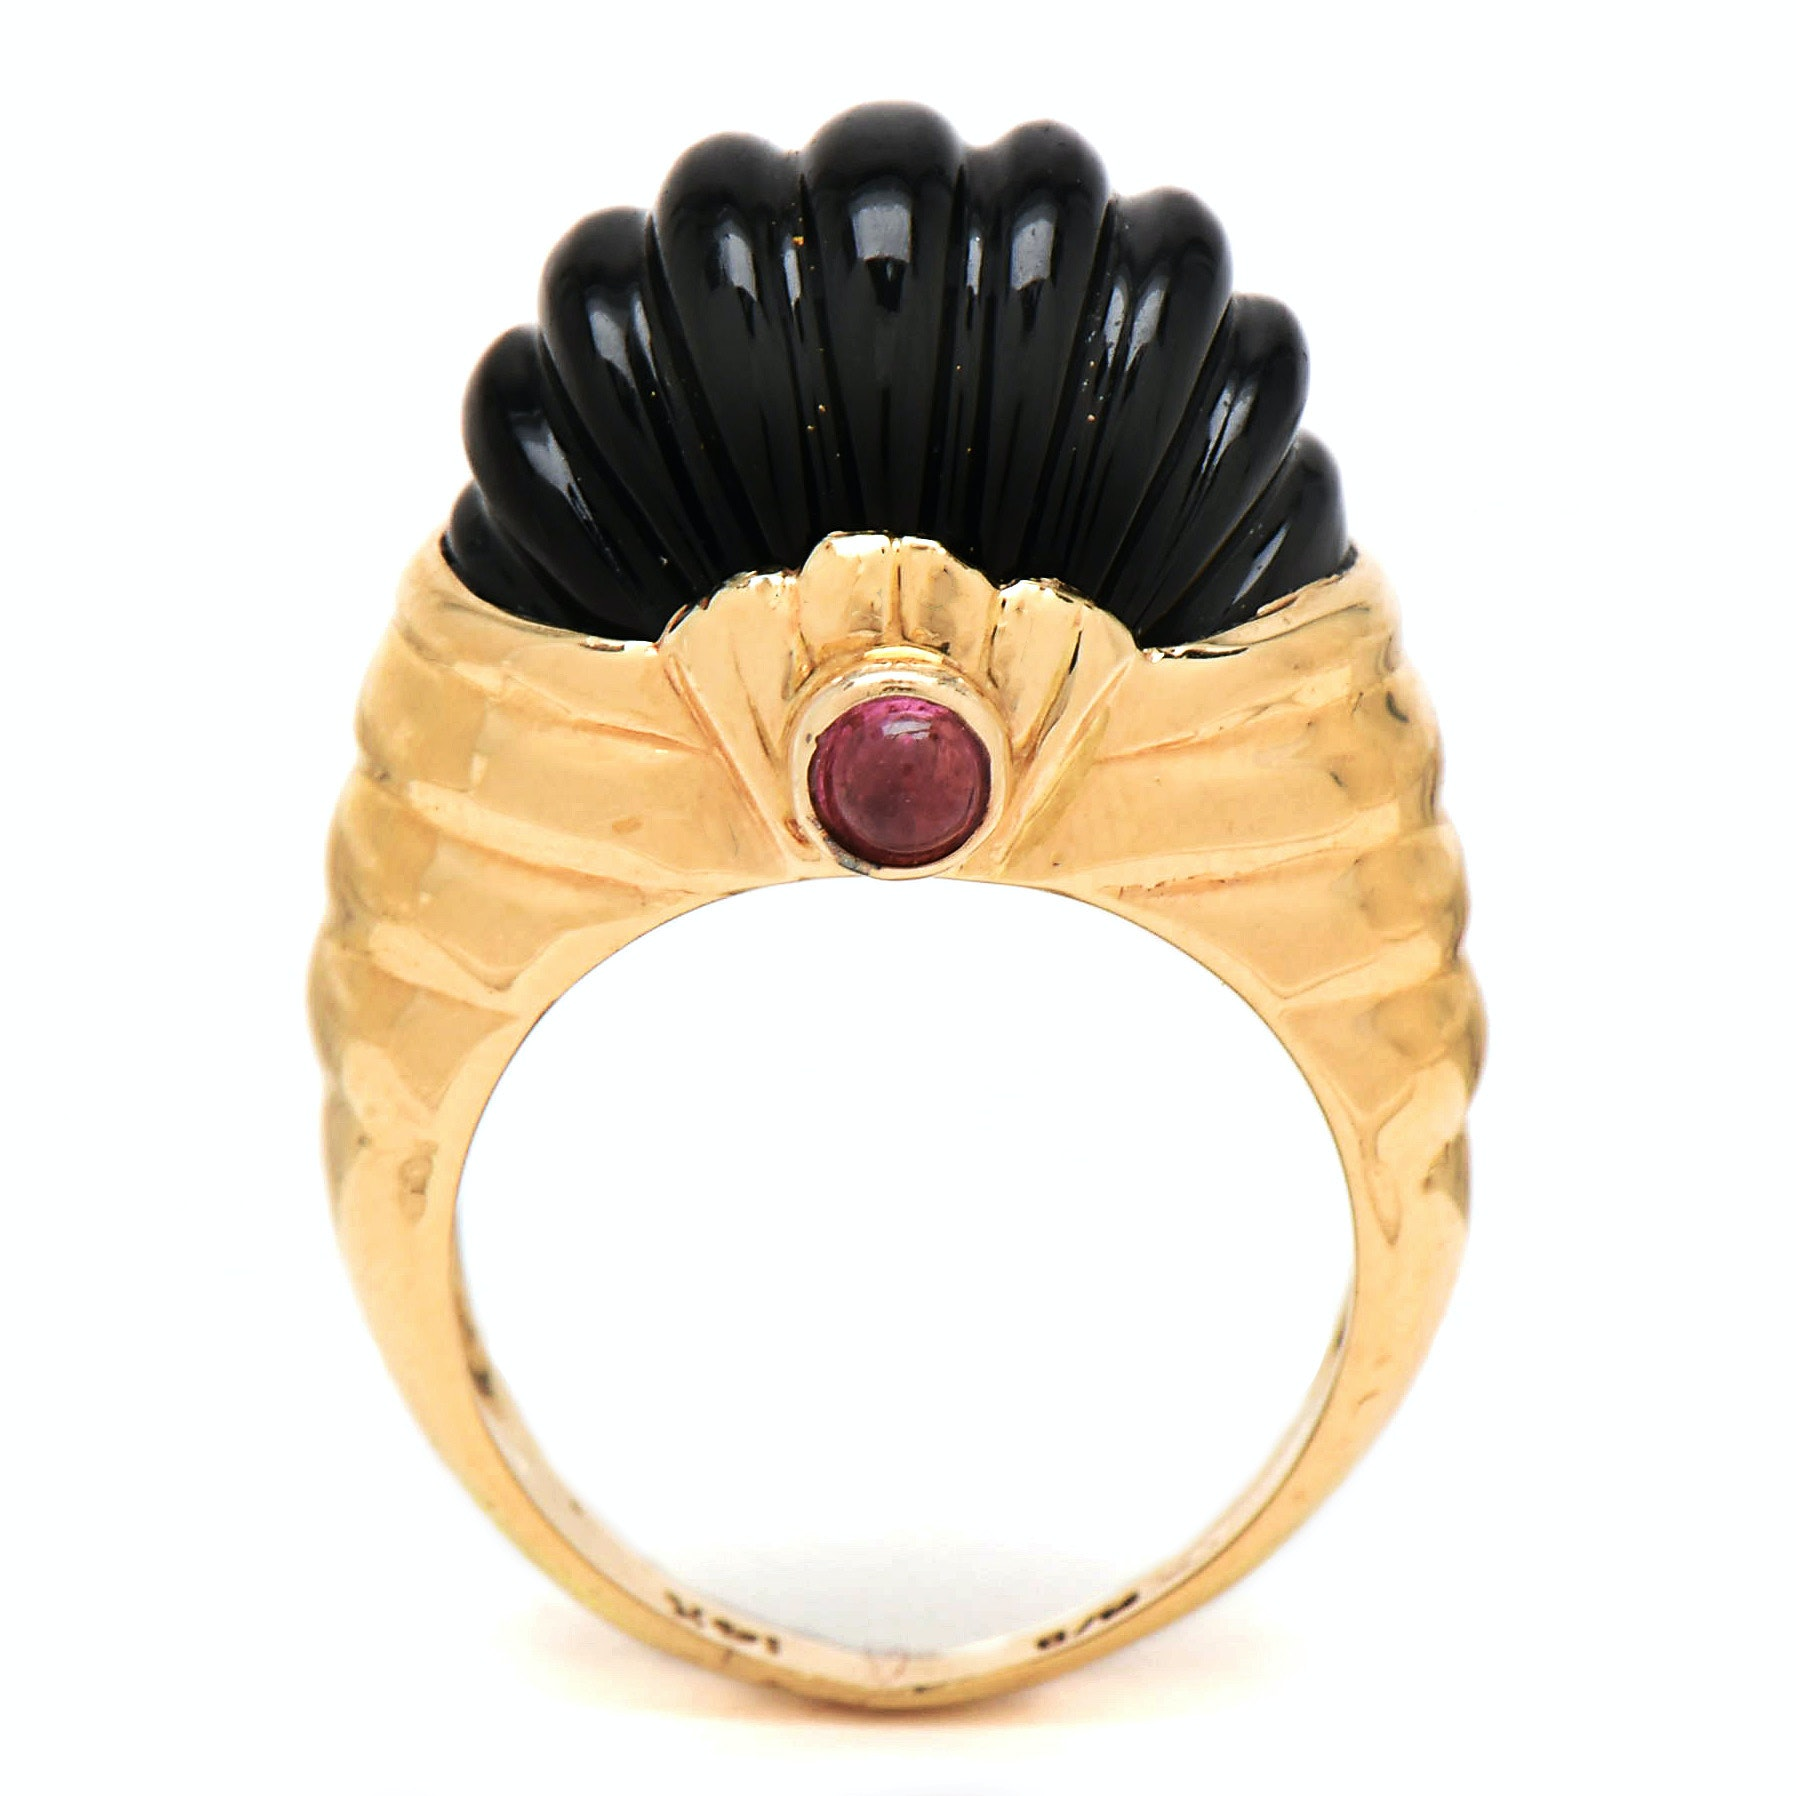 14K Yellow Gold Carved Black Onyx and Rhodolite Garnet Statement Ring